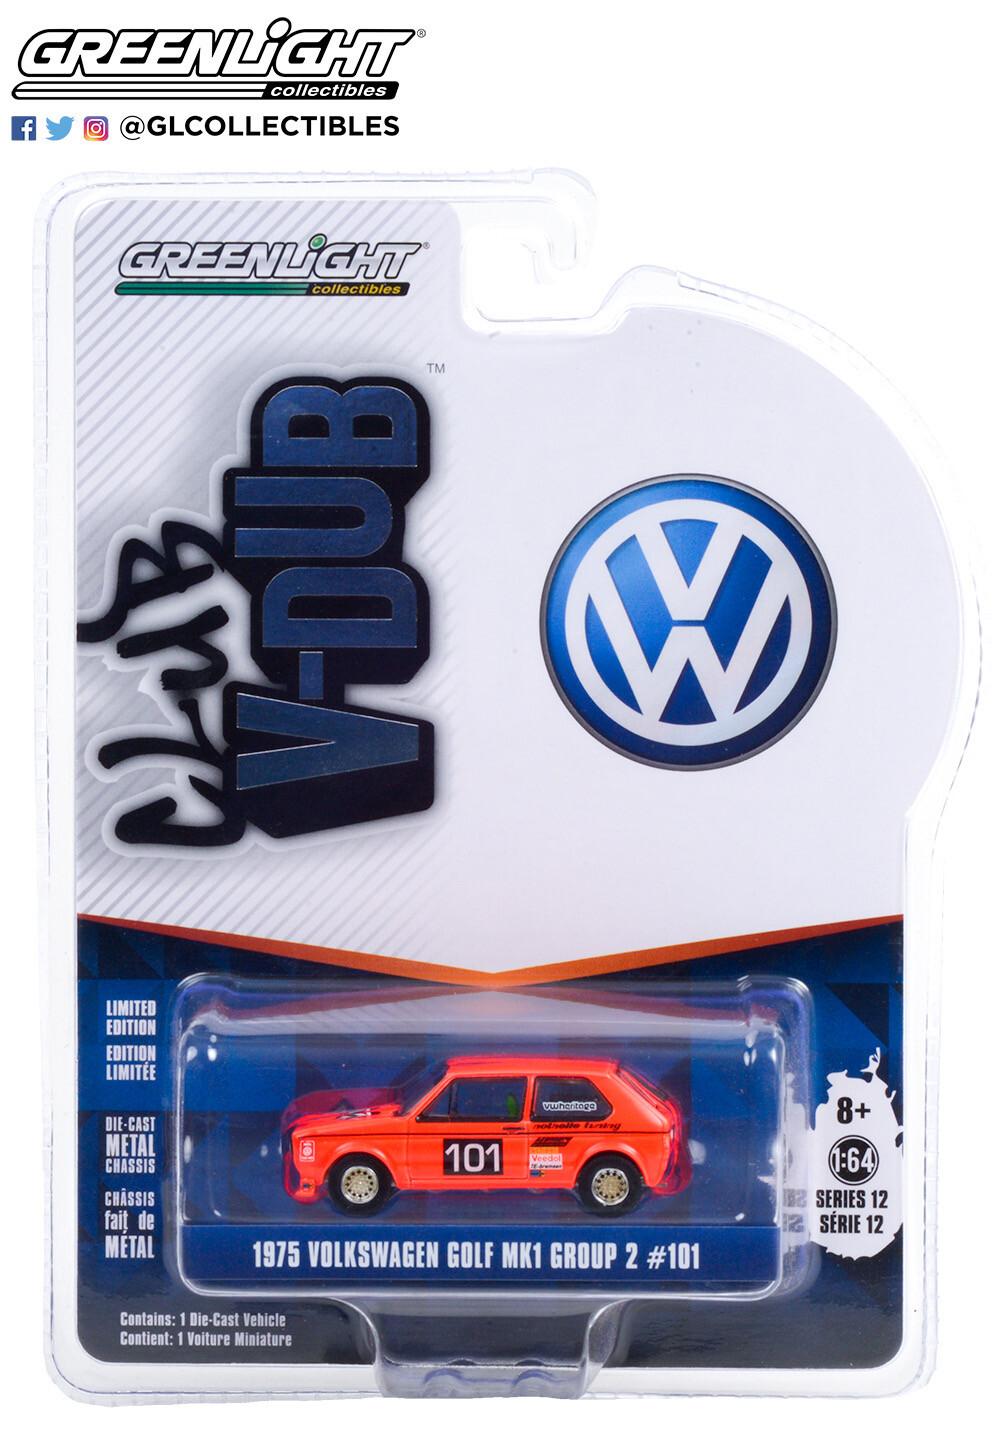 1975 Volkswagen Golf MK1